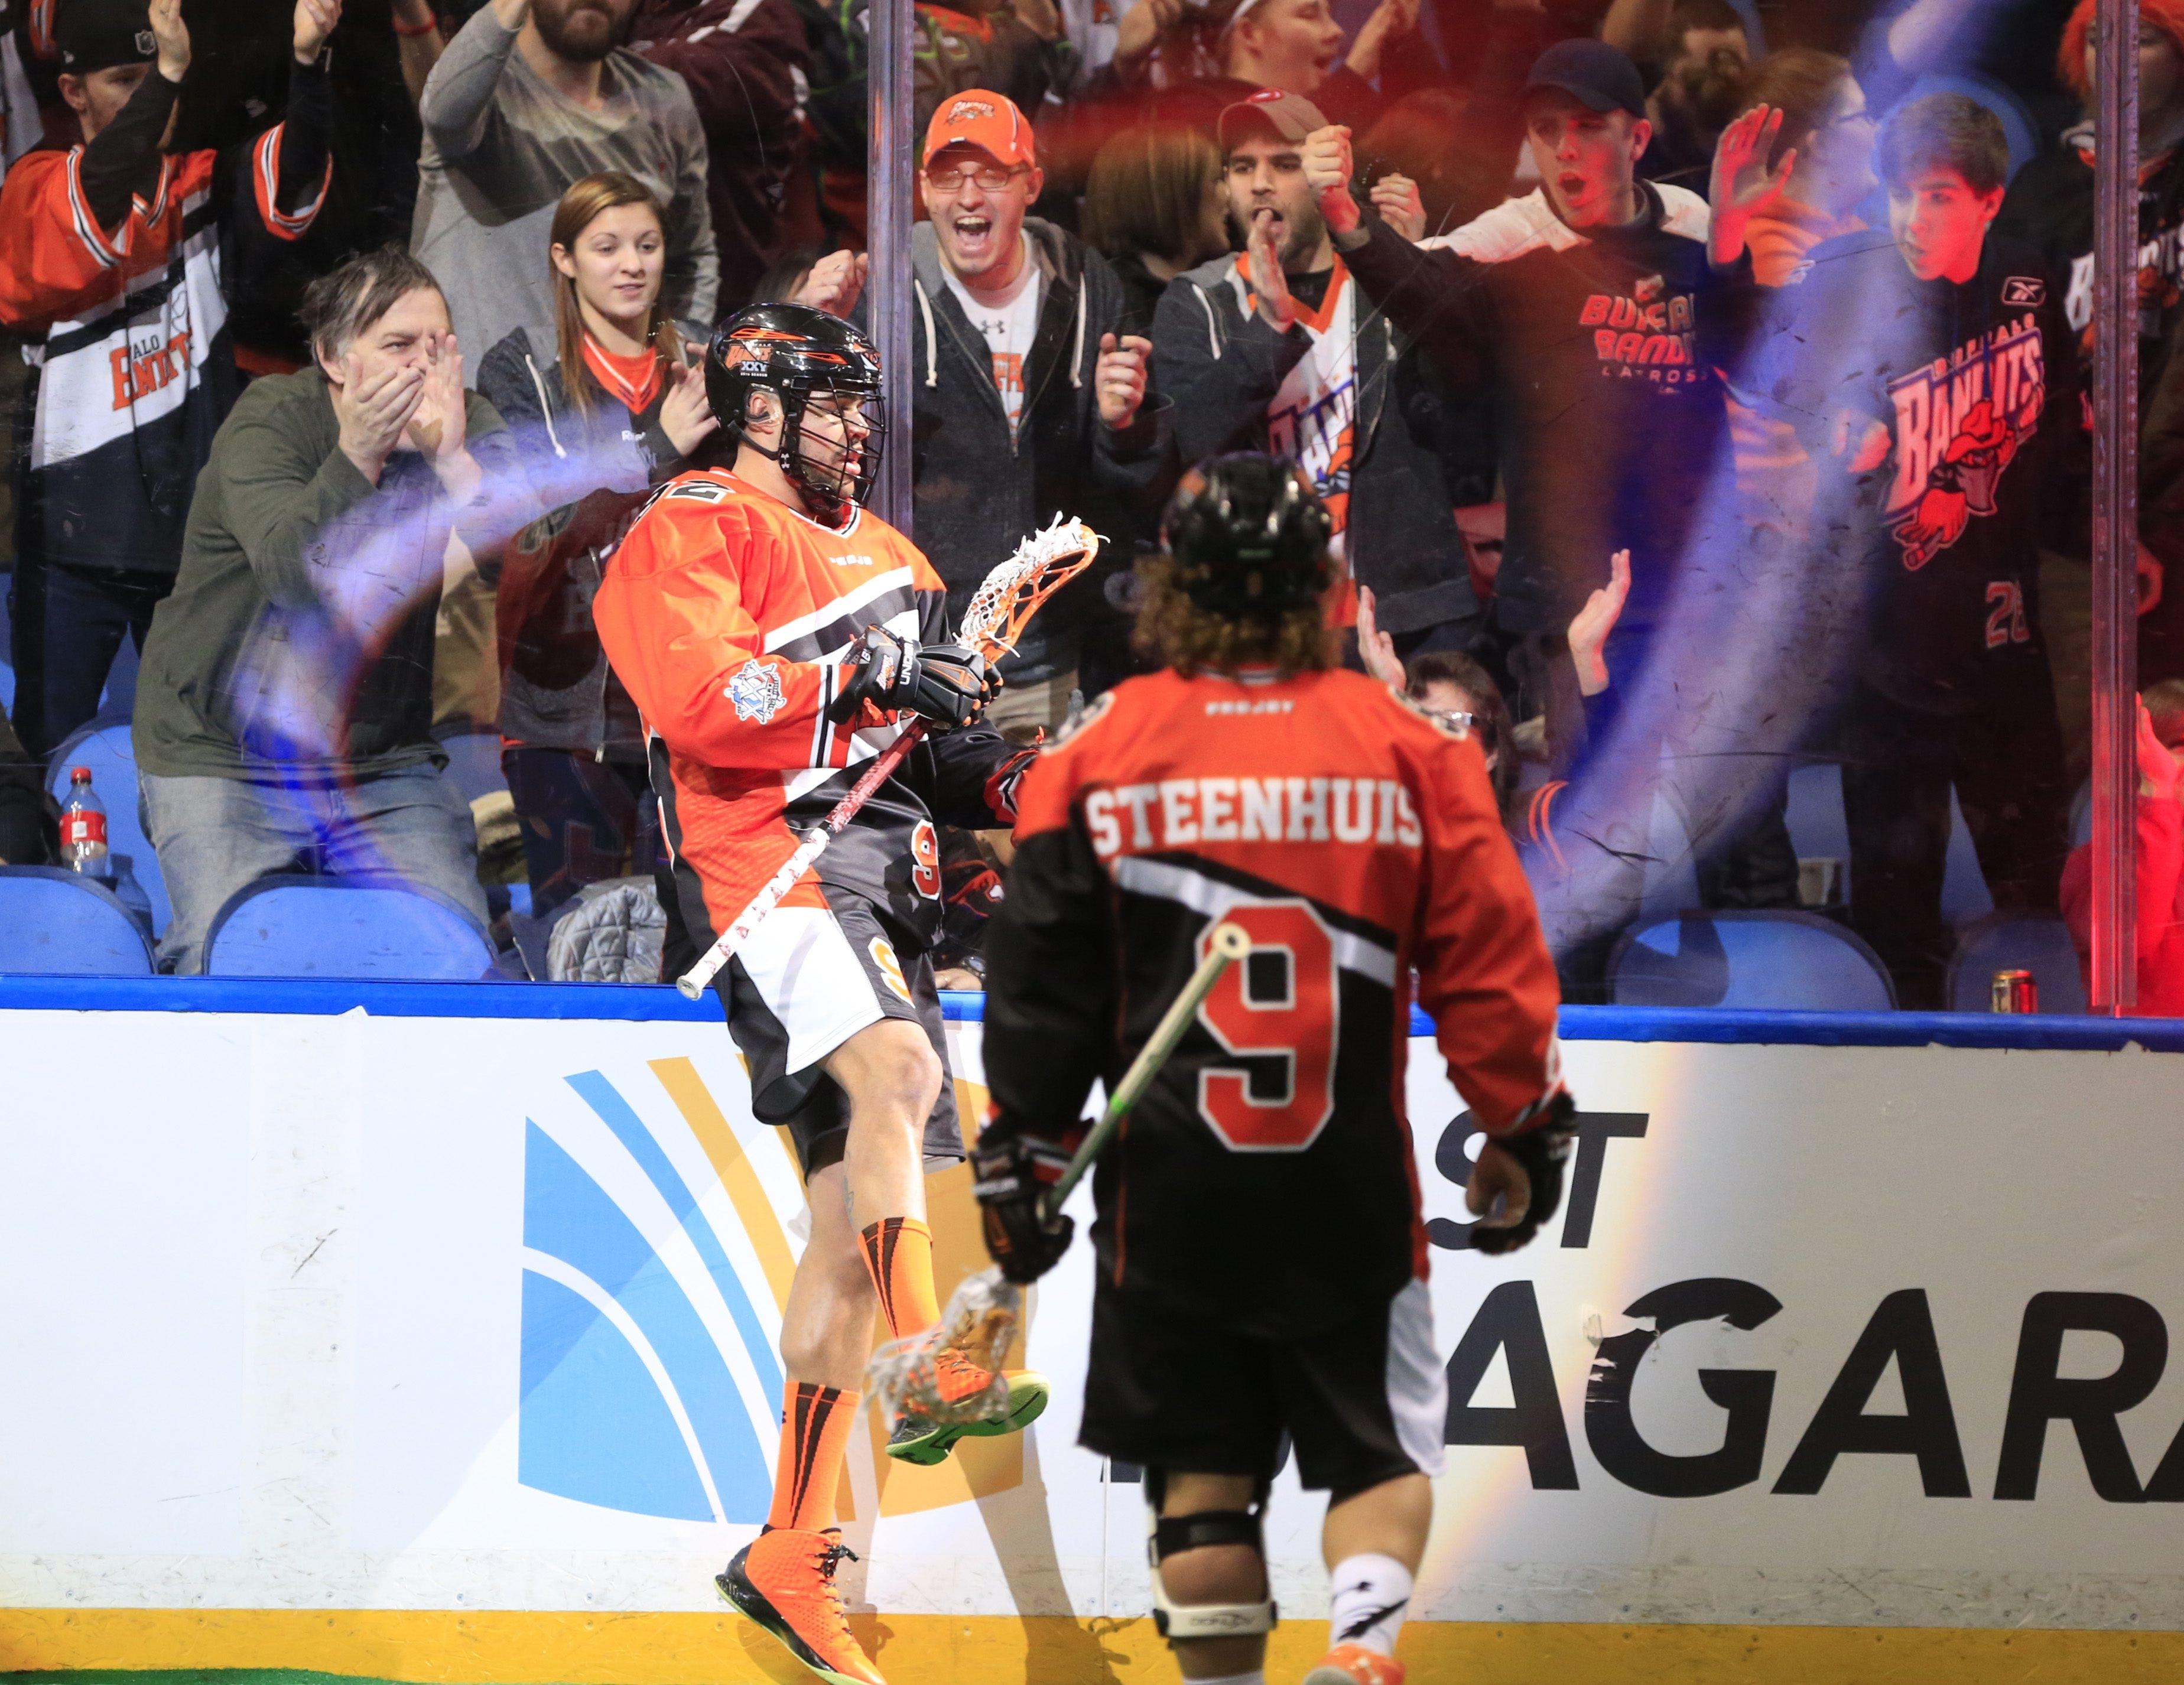 Buffalo's Dhane Smith has been a big reason for the Bandits' success this season.